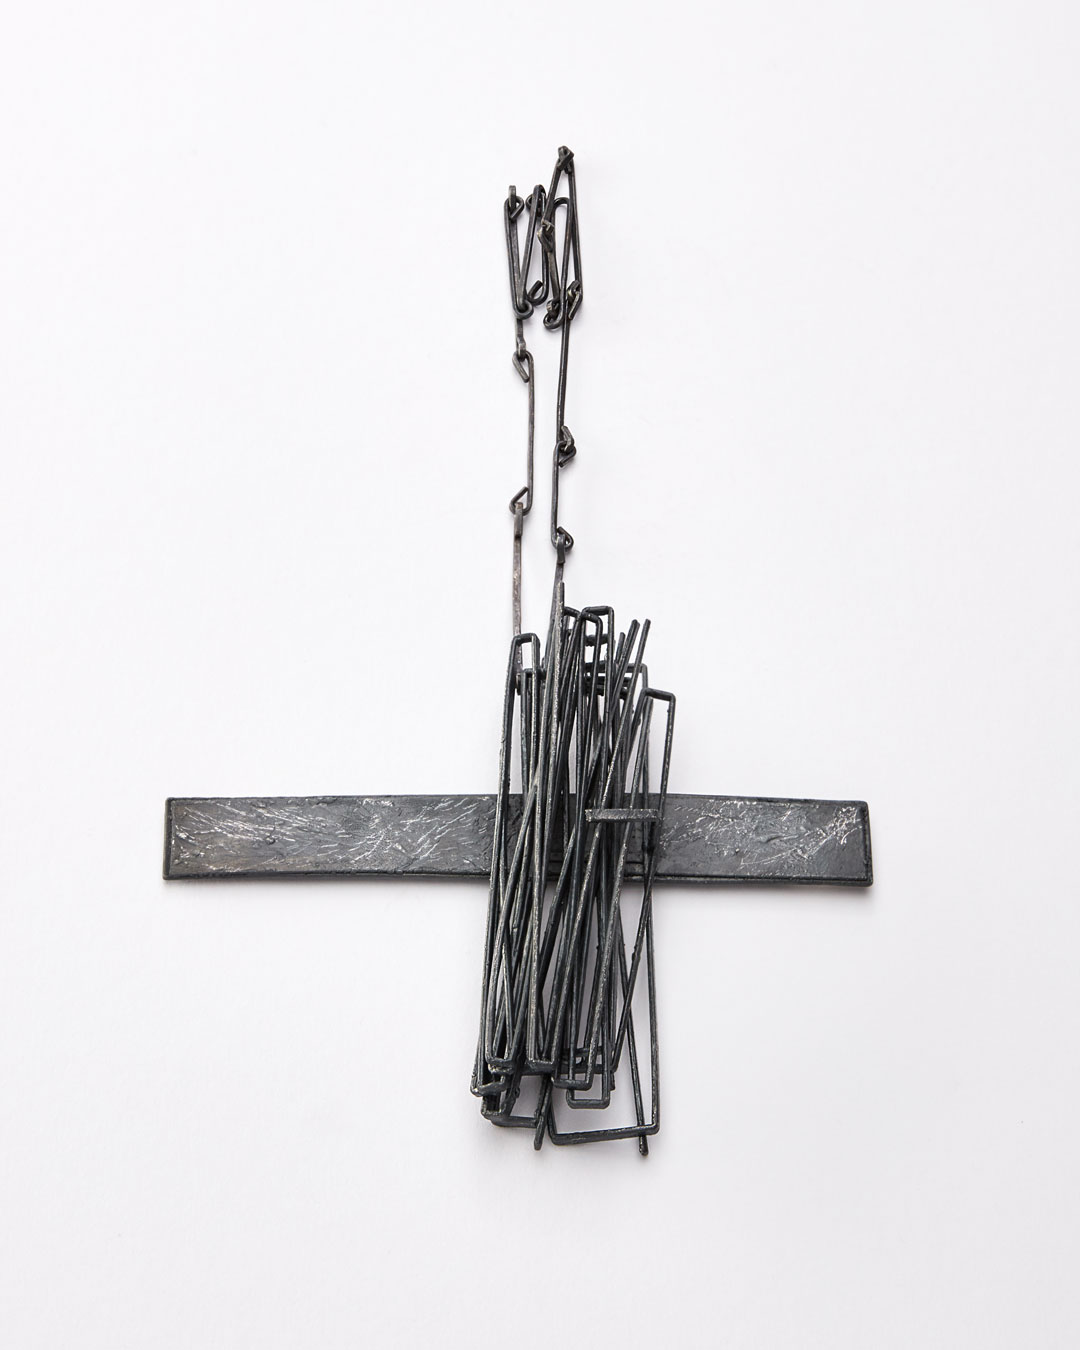 Iris Bodemer, Gegenüberstellung 4 (Juxtaposition 4), 2019, pendant; silver, thermoplastic, 110 x 140 x 25 mm, €3500